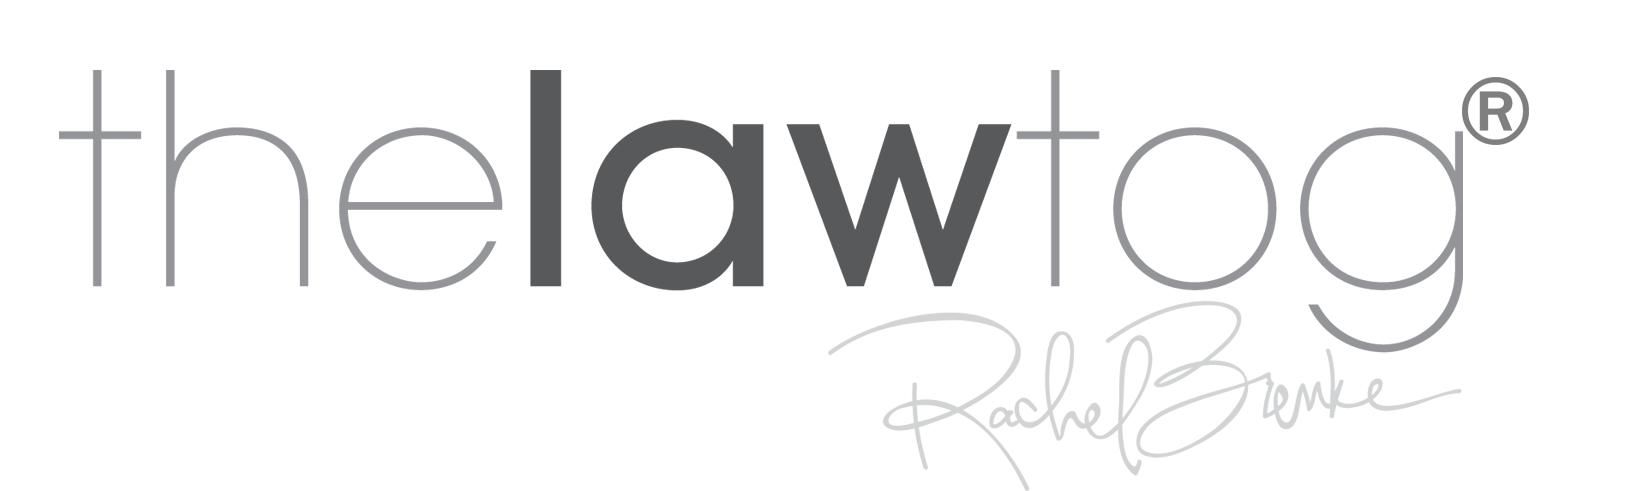 TheLawTog Logo.png